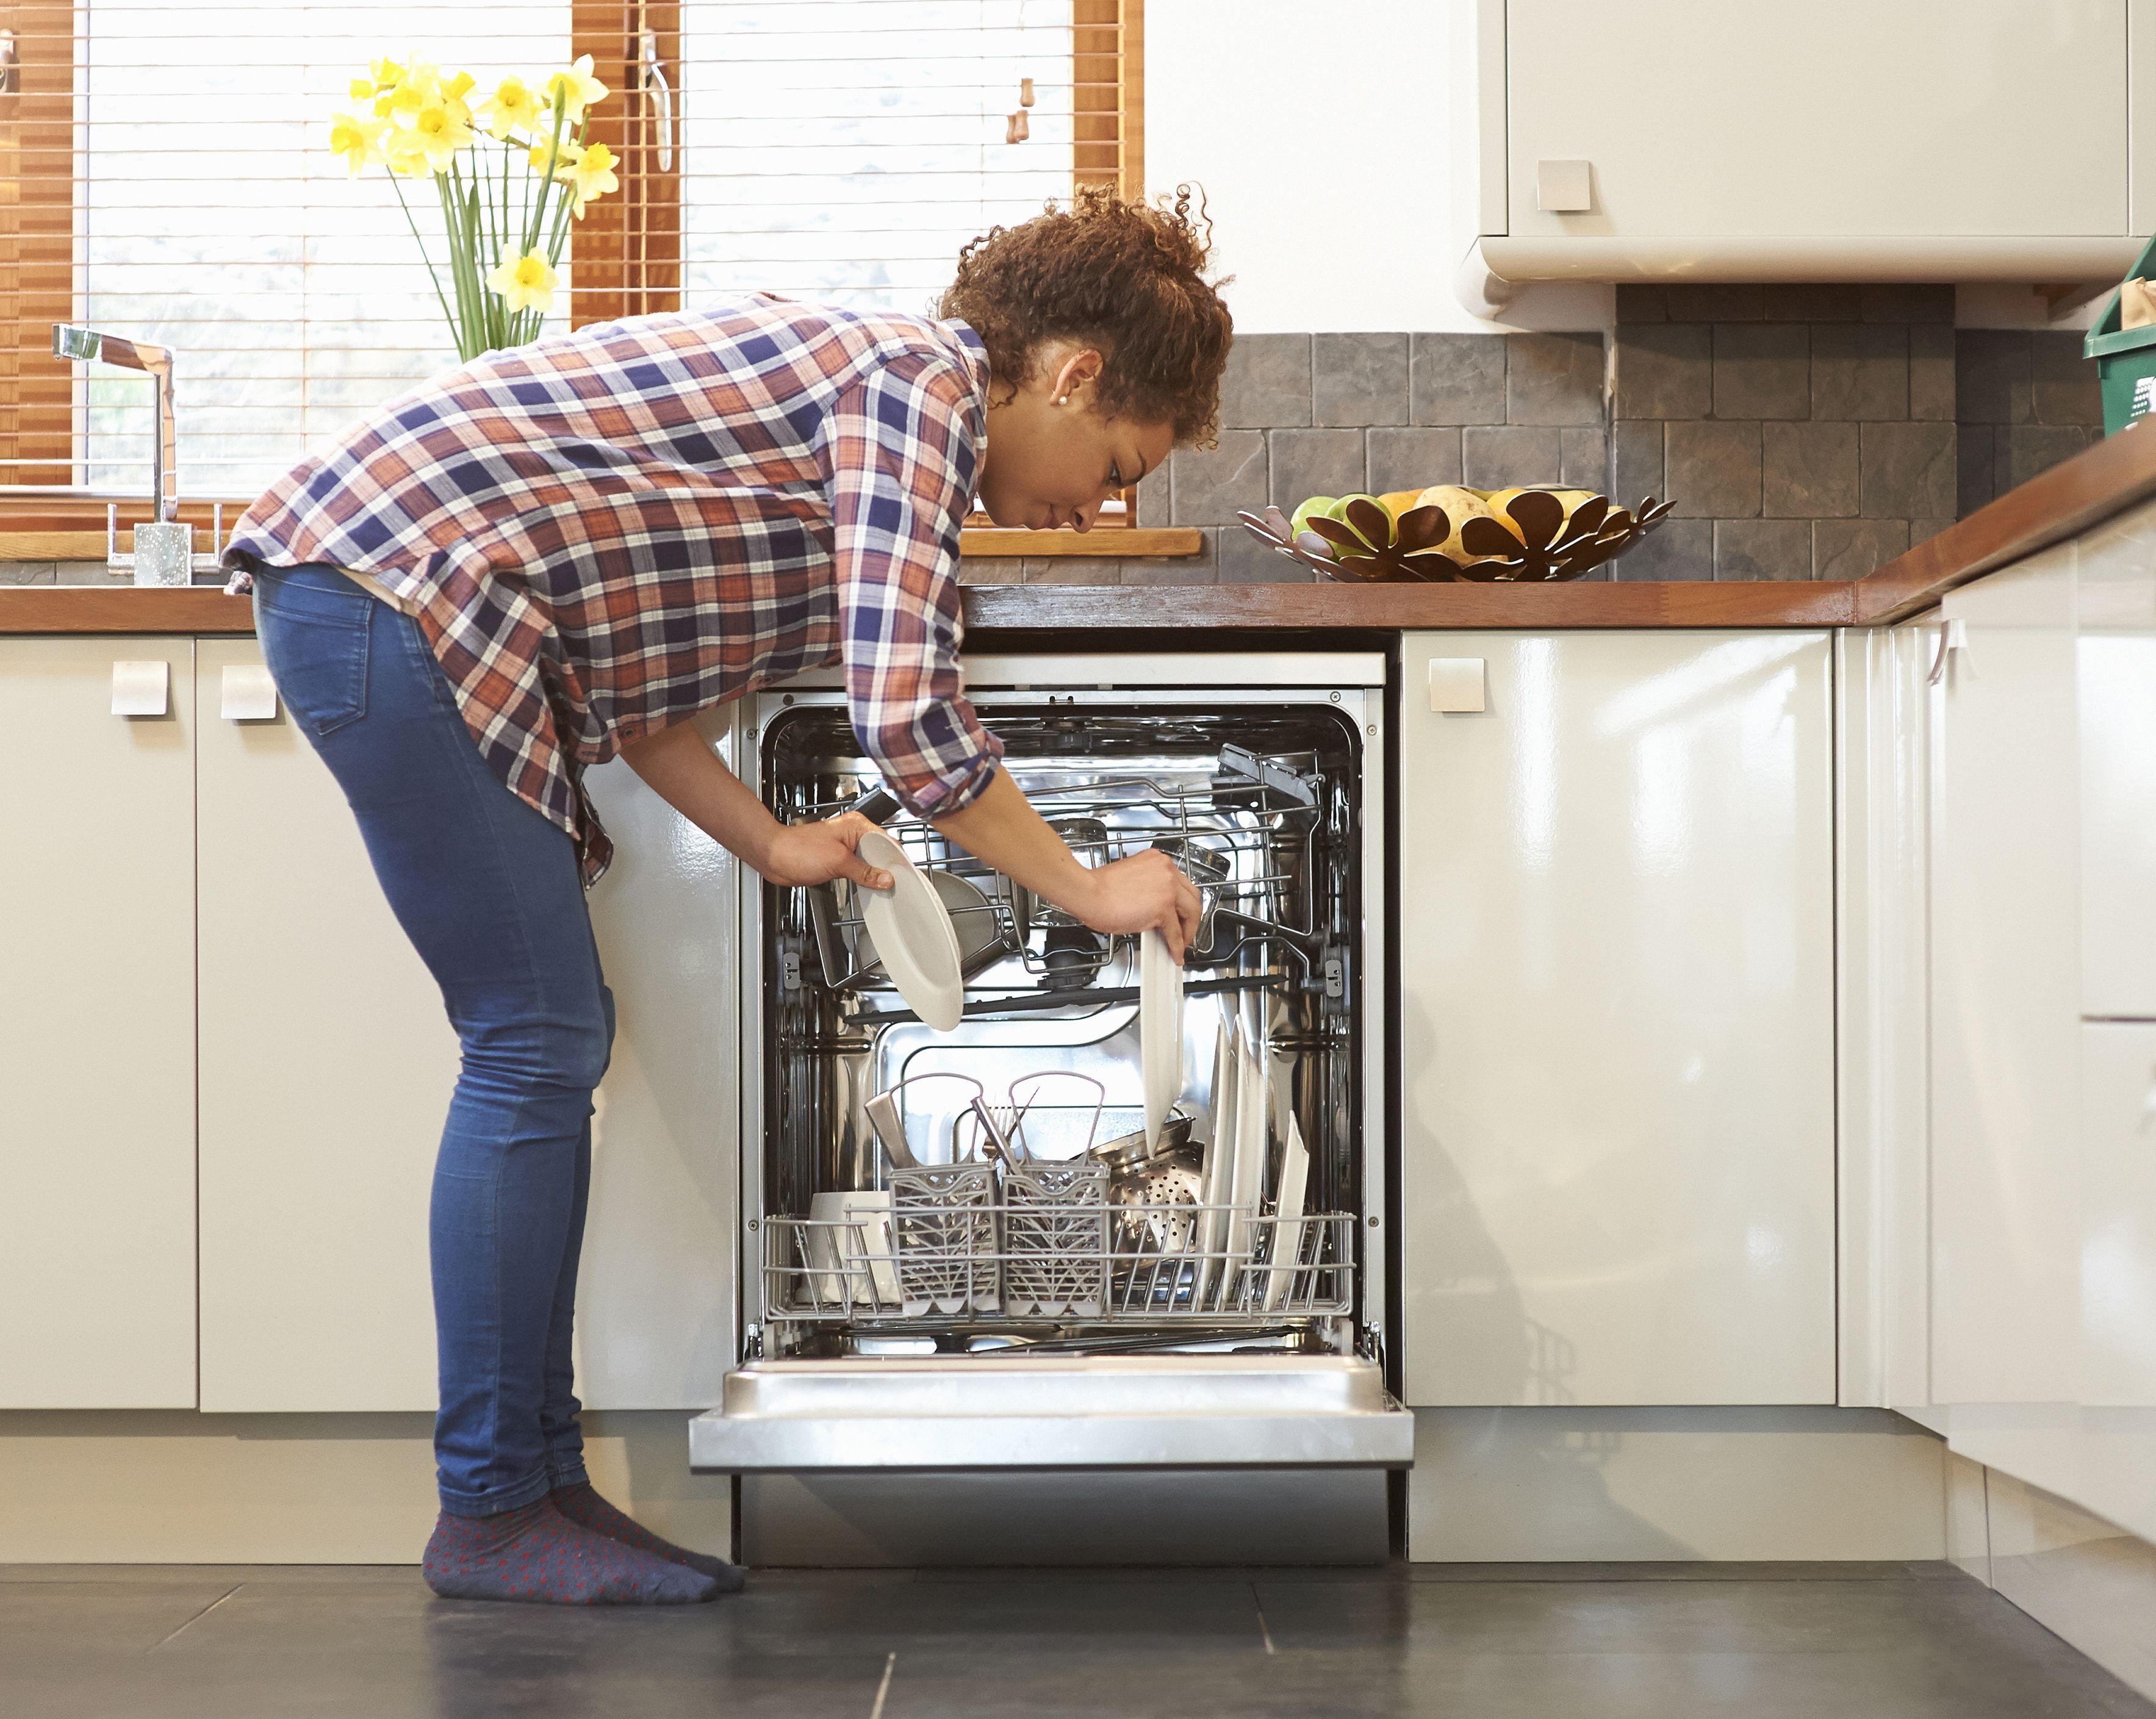 10 Surprising Uses For Vinegar Best Dishwasher Cleaning Your Dishwasher Best Dishwasher Detergent,Mid Century Modern Kitchen Countertops